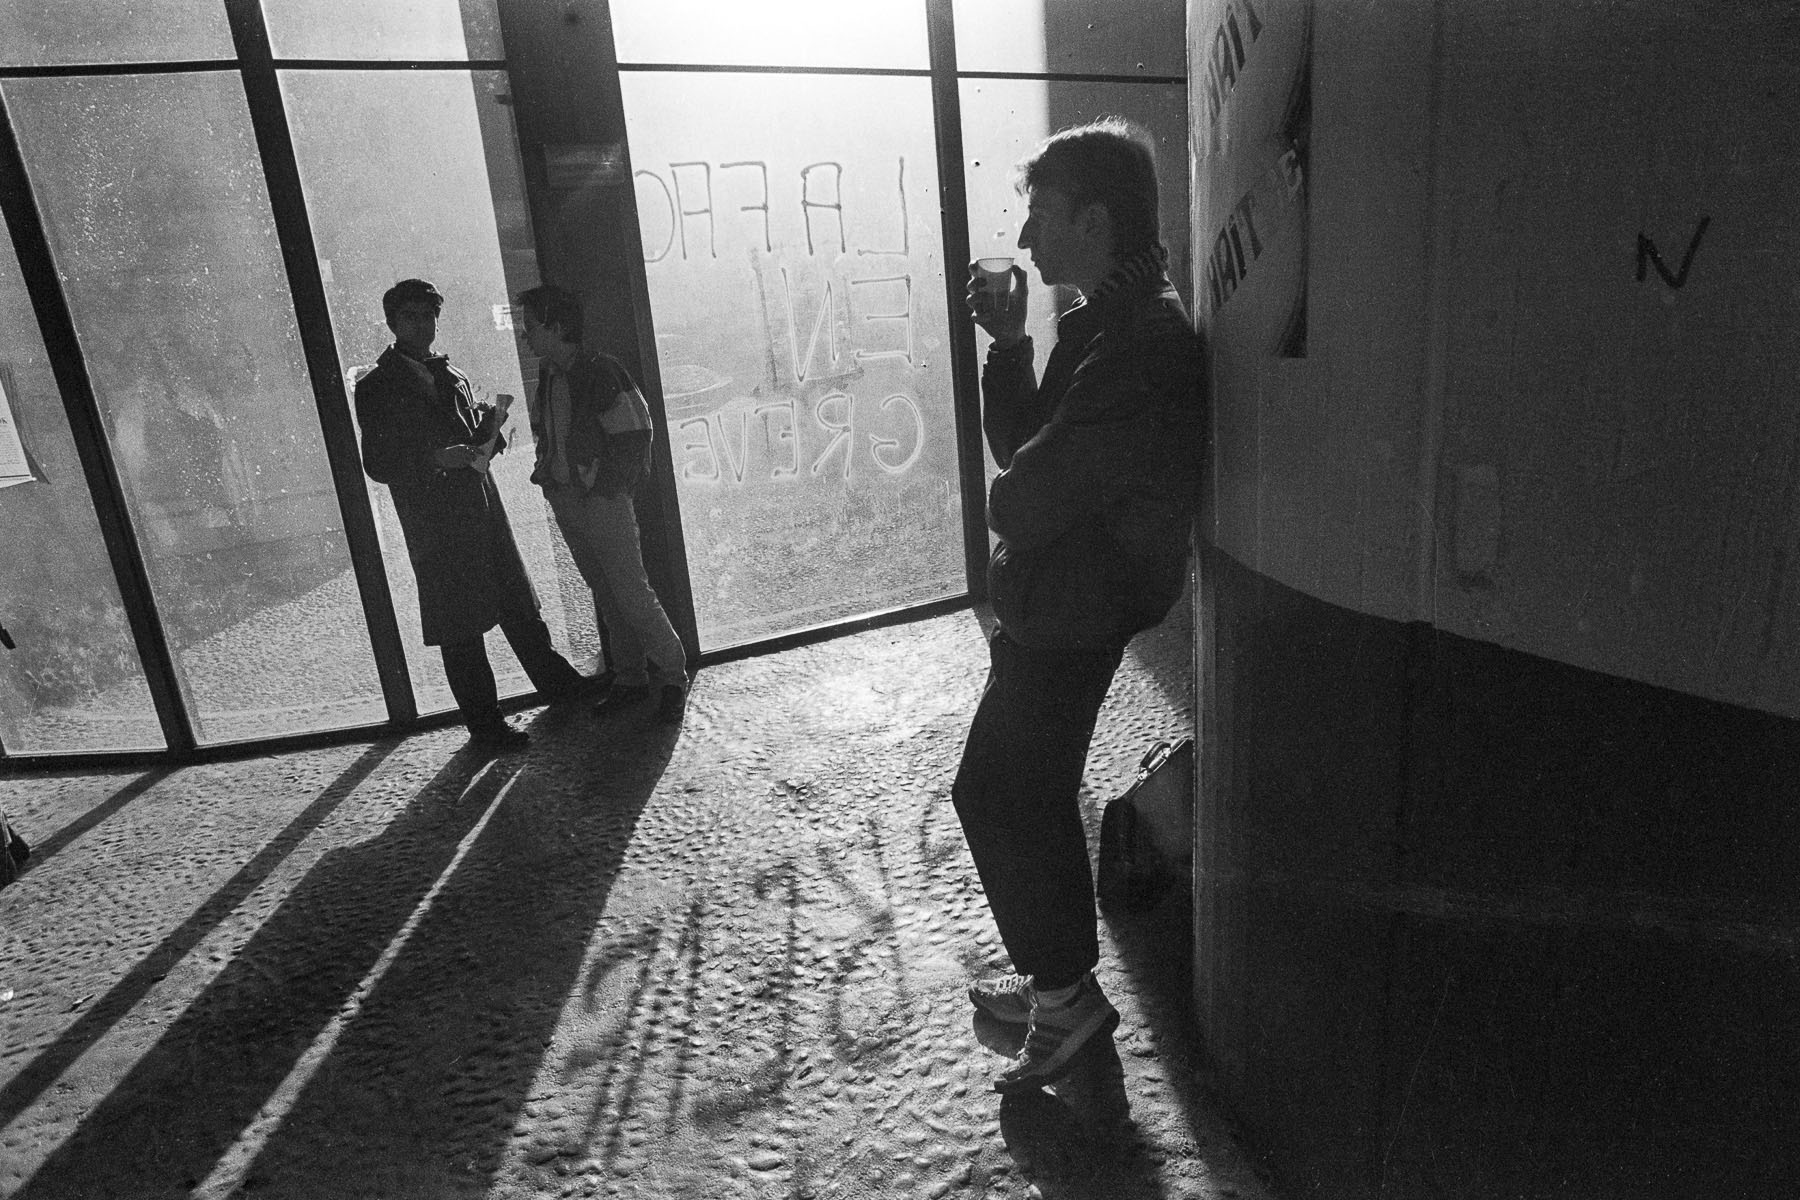 Students strike against Devaquet minister reform draft in Tolbiac University on november 1986